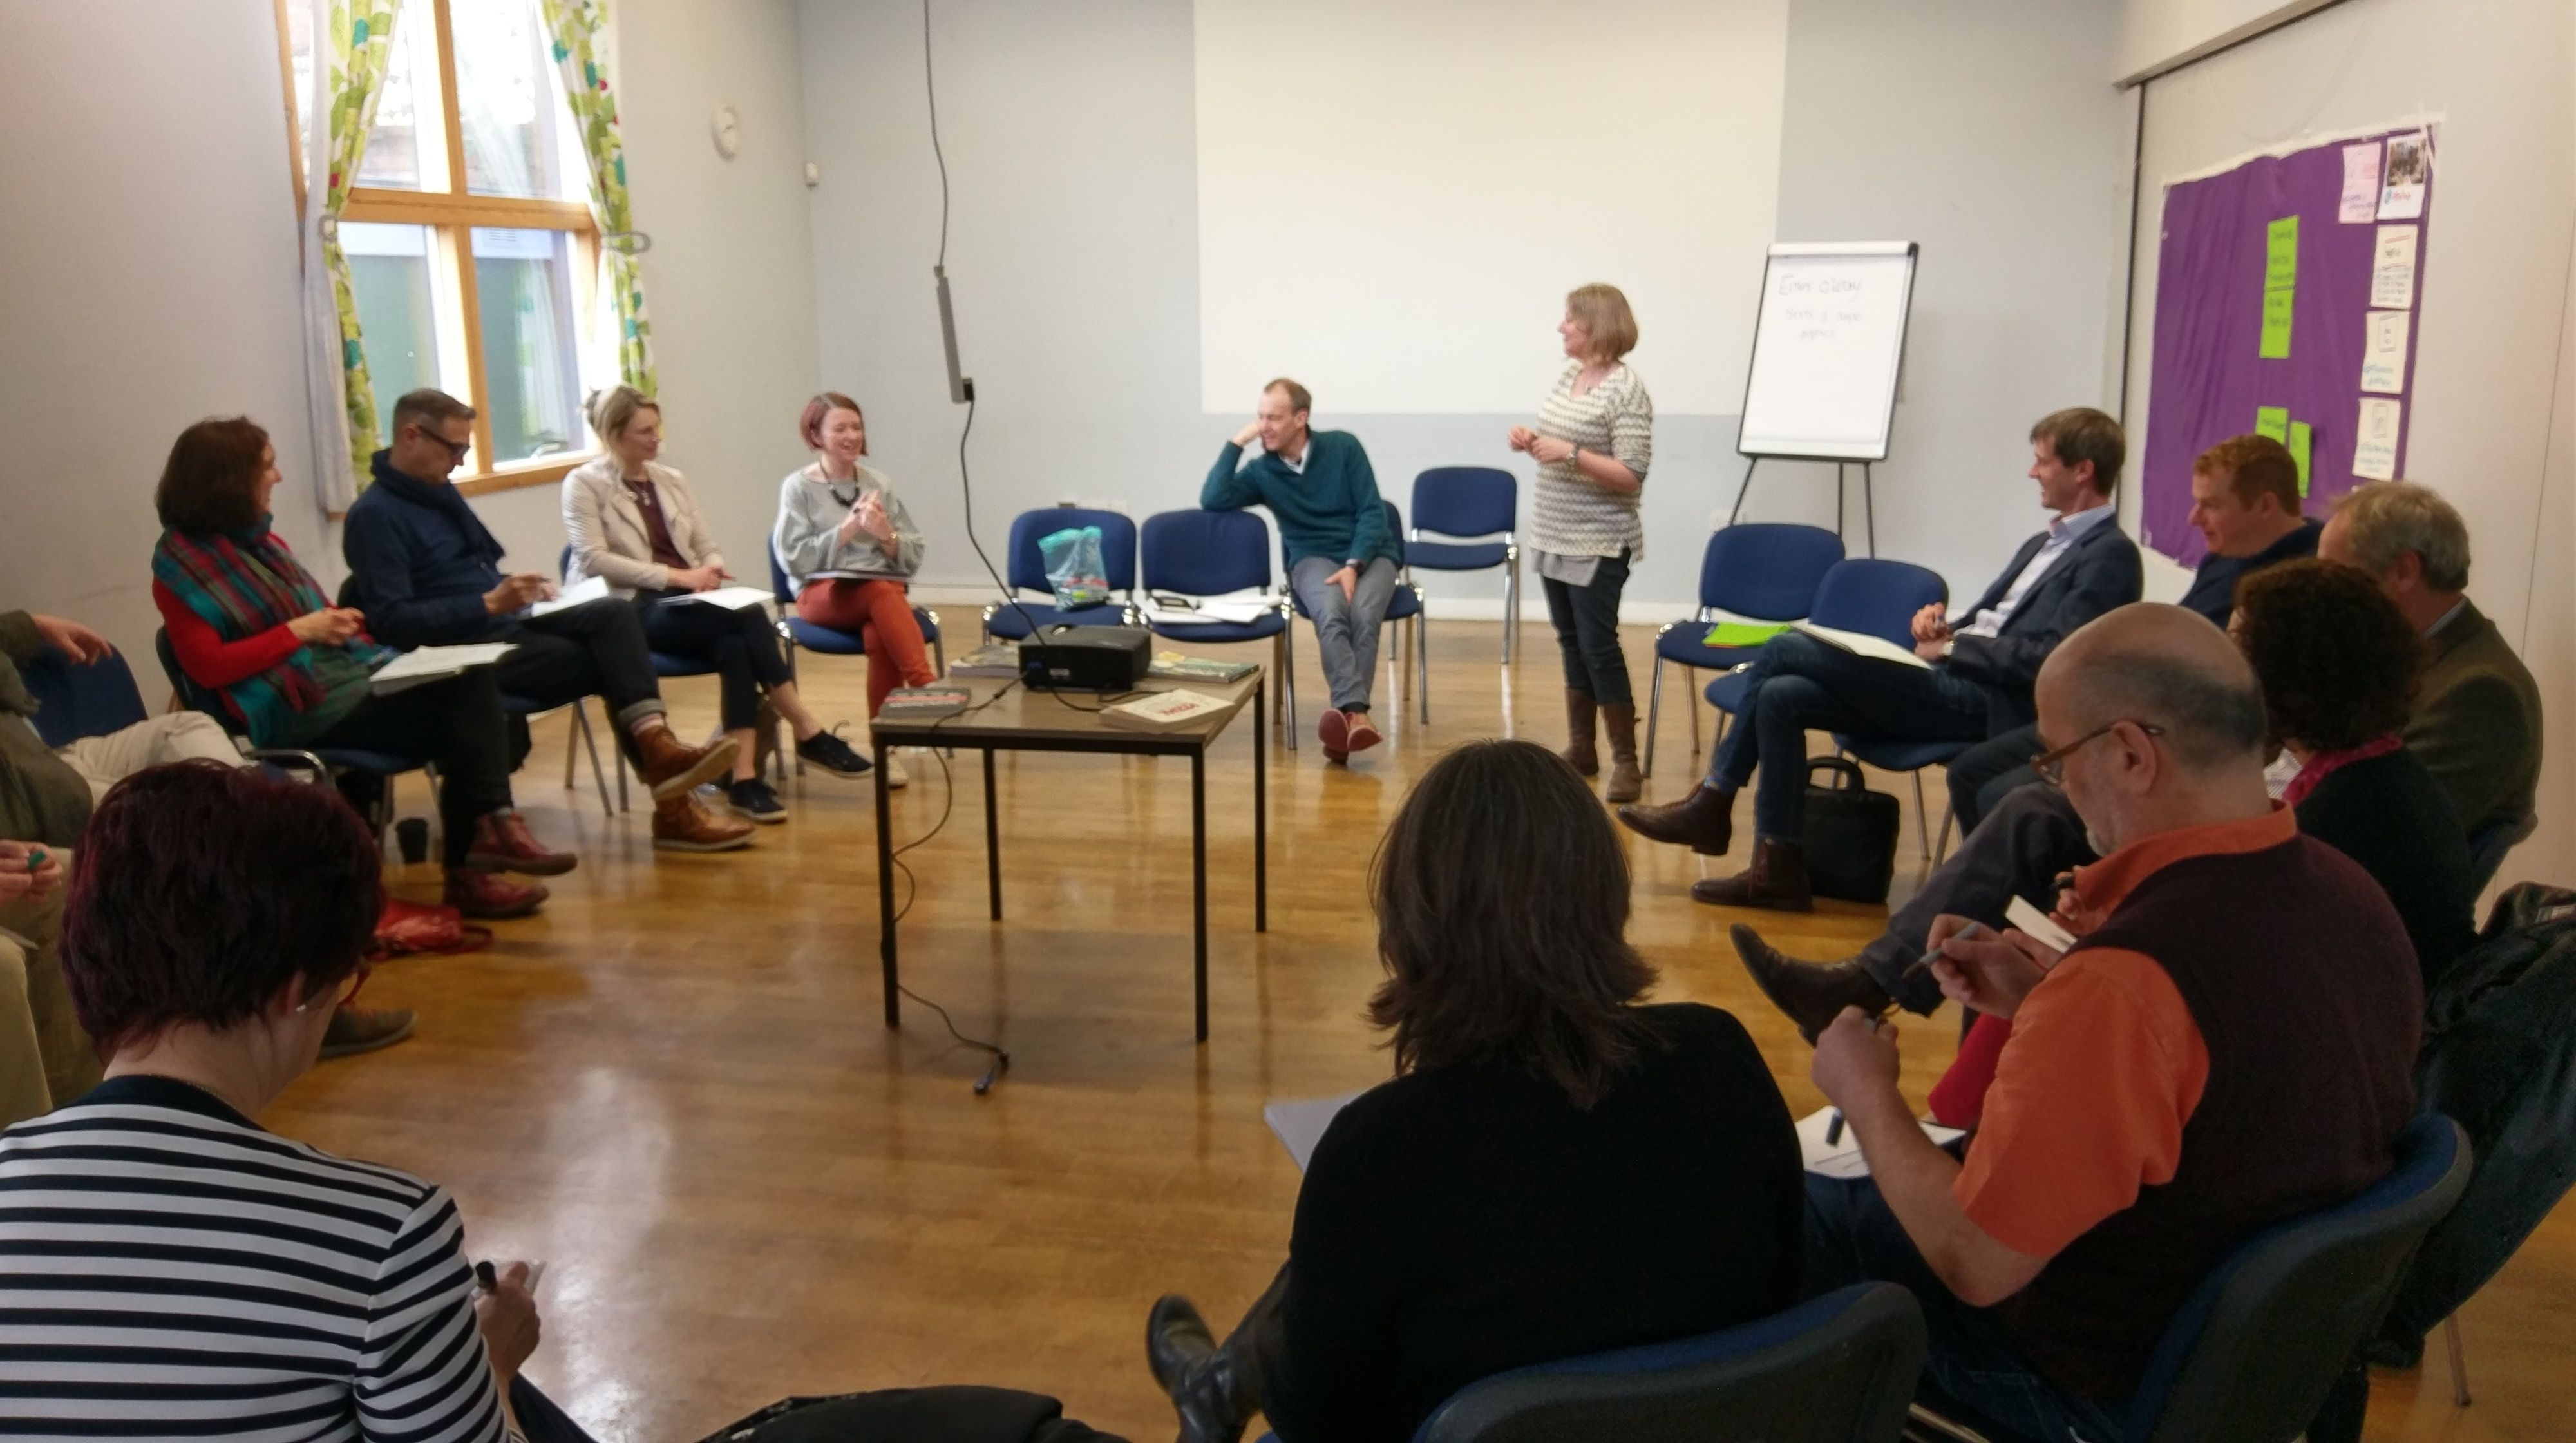 IAF South West England facilitators and friends